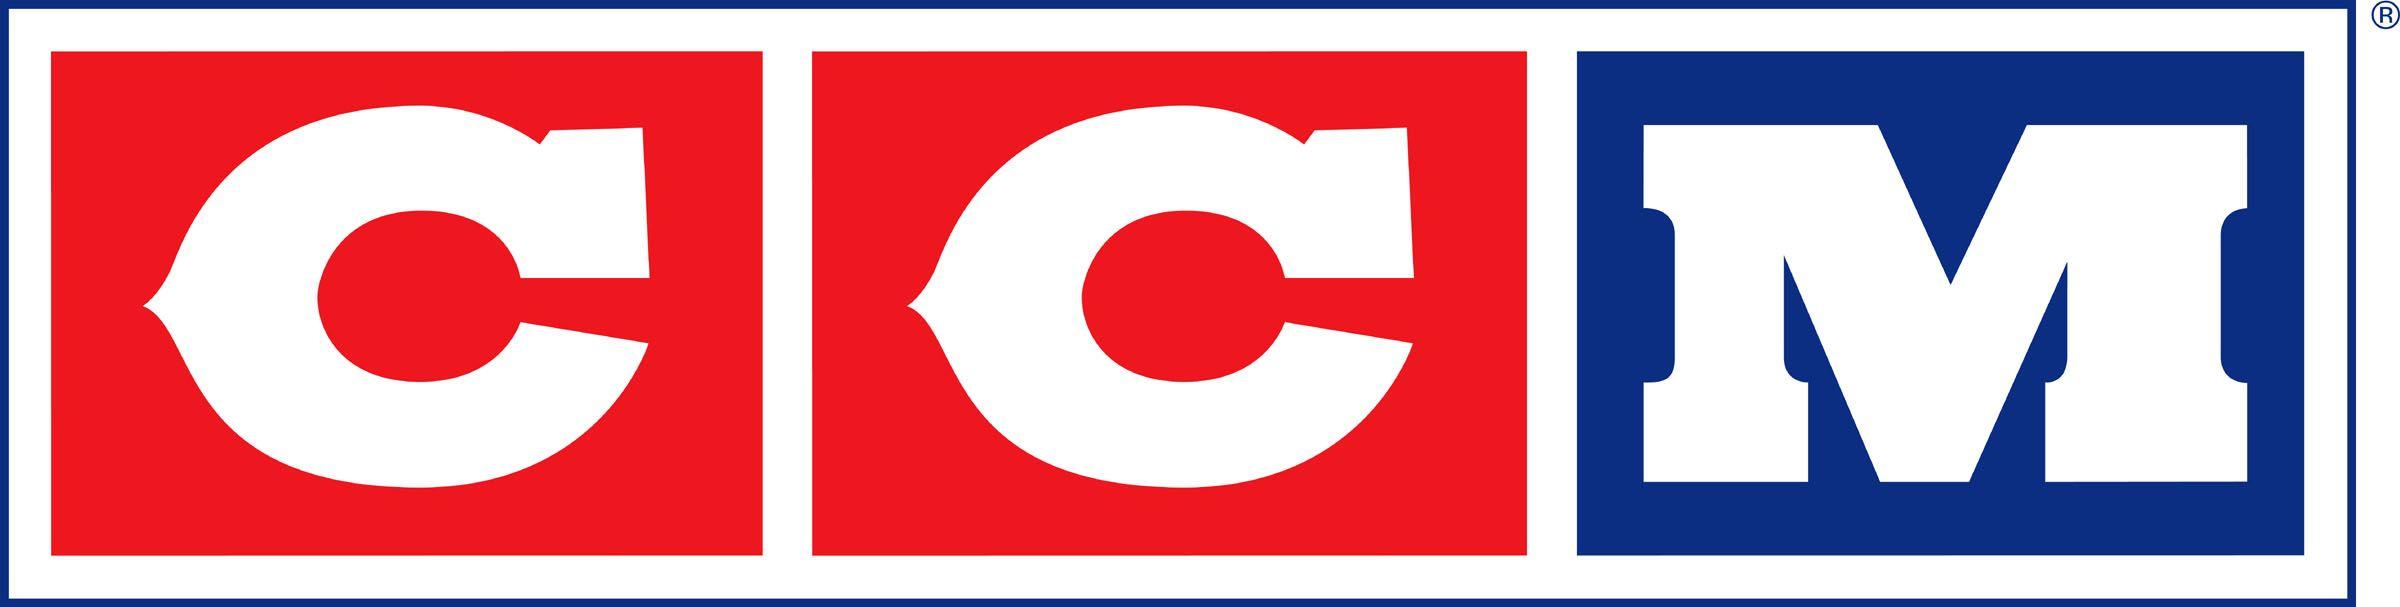 Ccm Logo He Shoots He Scores Pinterest Ccm Hockey